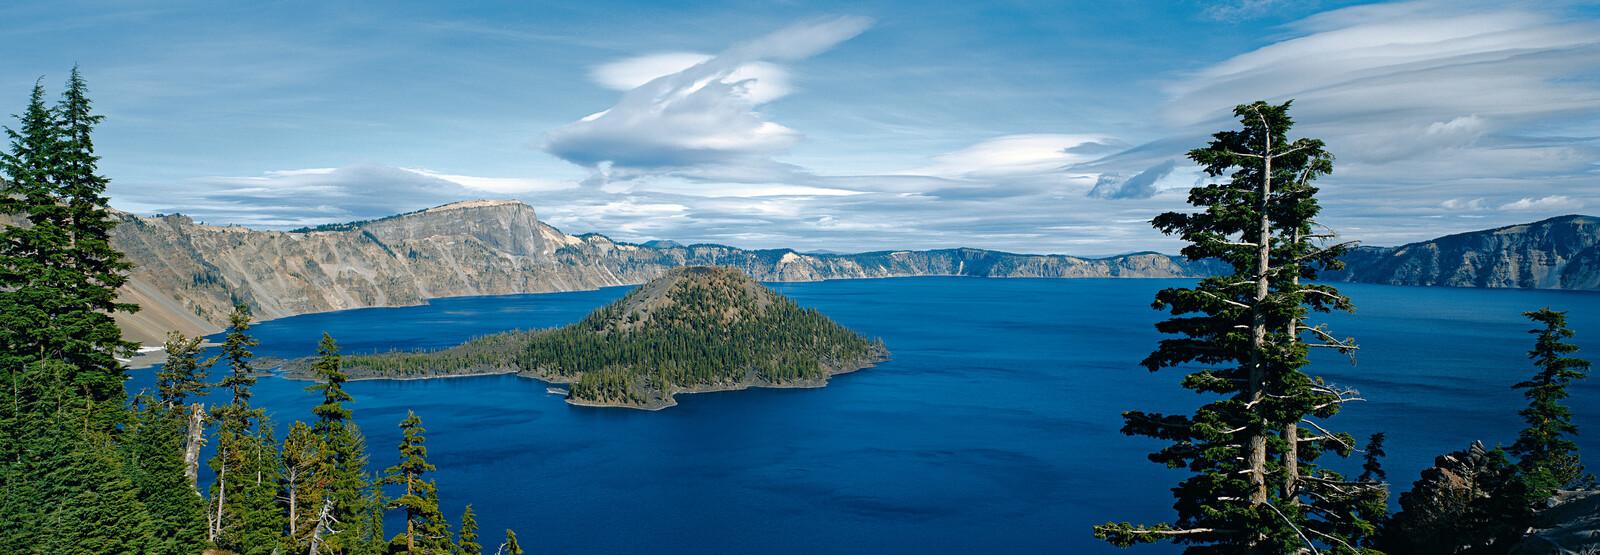 Crater Lake National Park, Oregon, USA - Axel M. Mosler